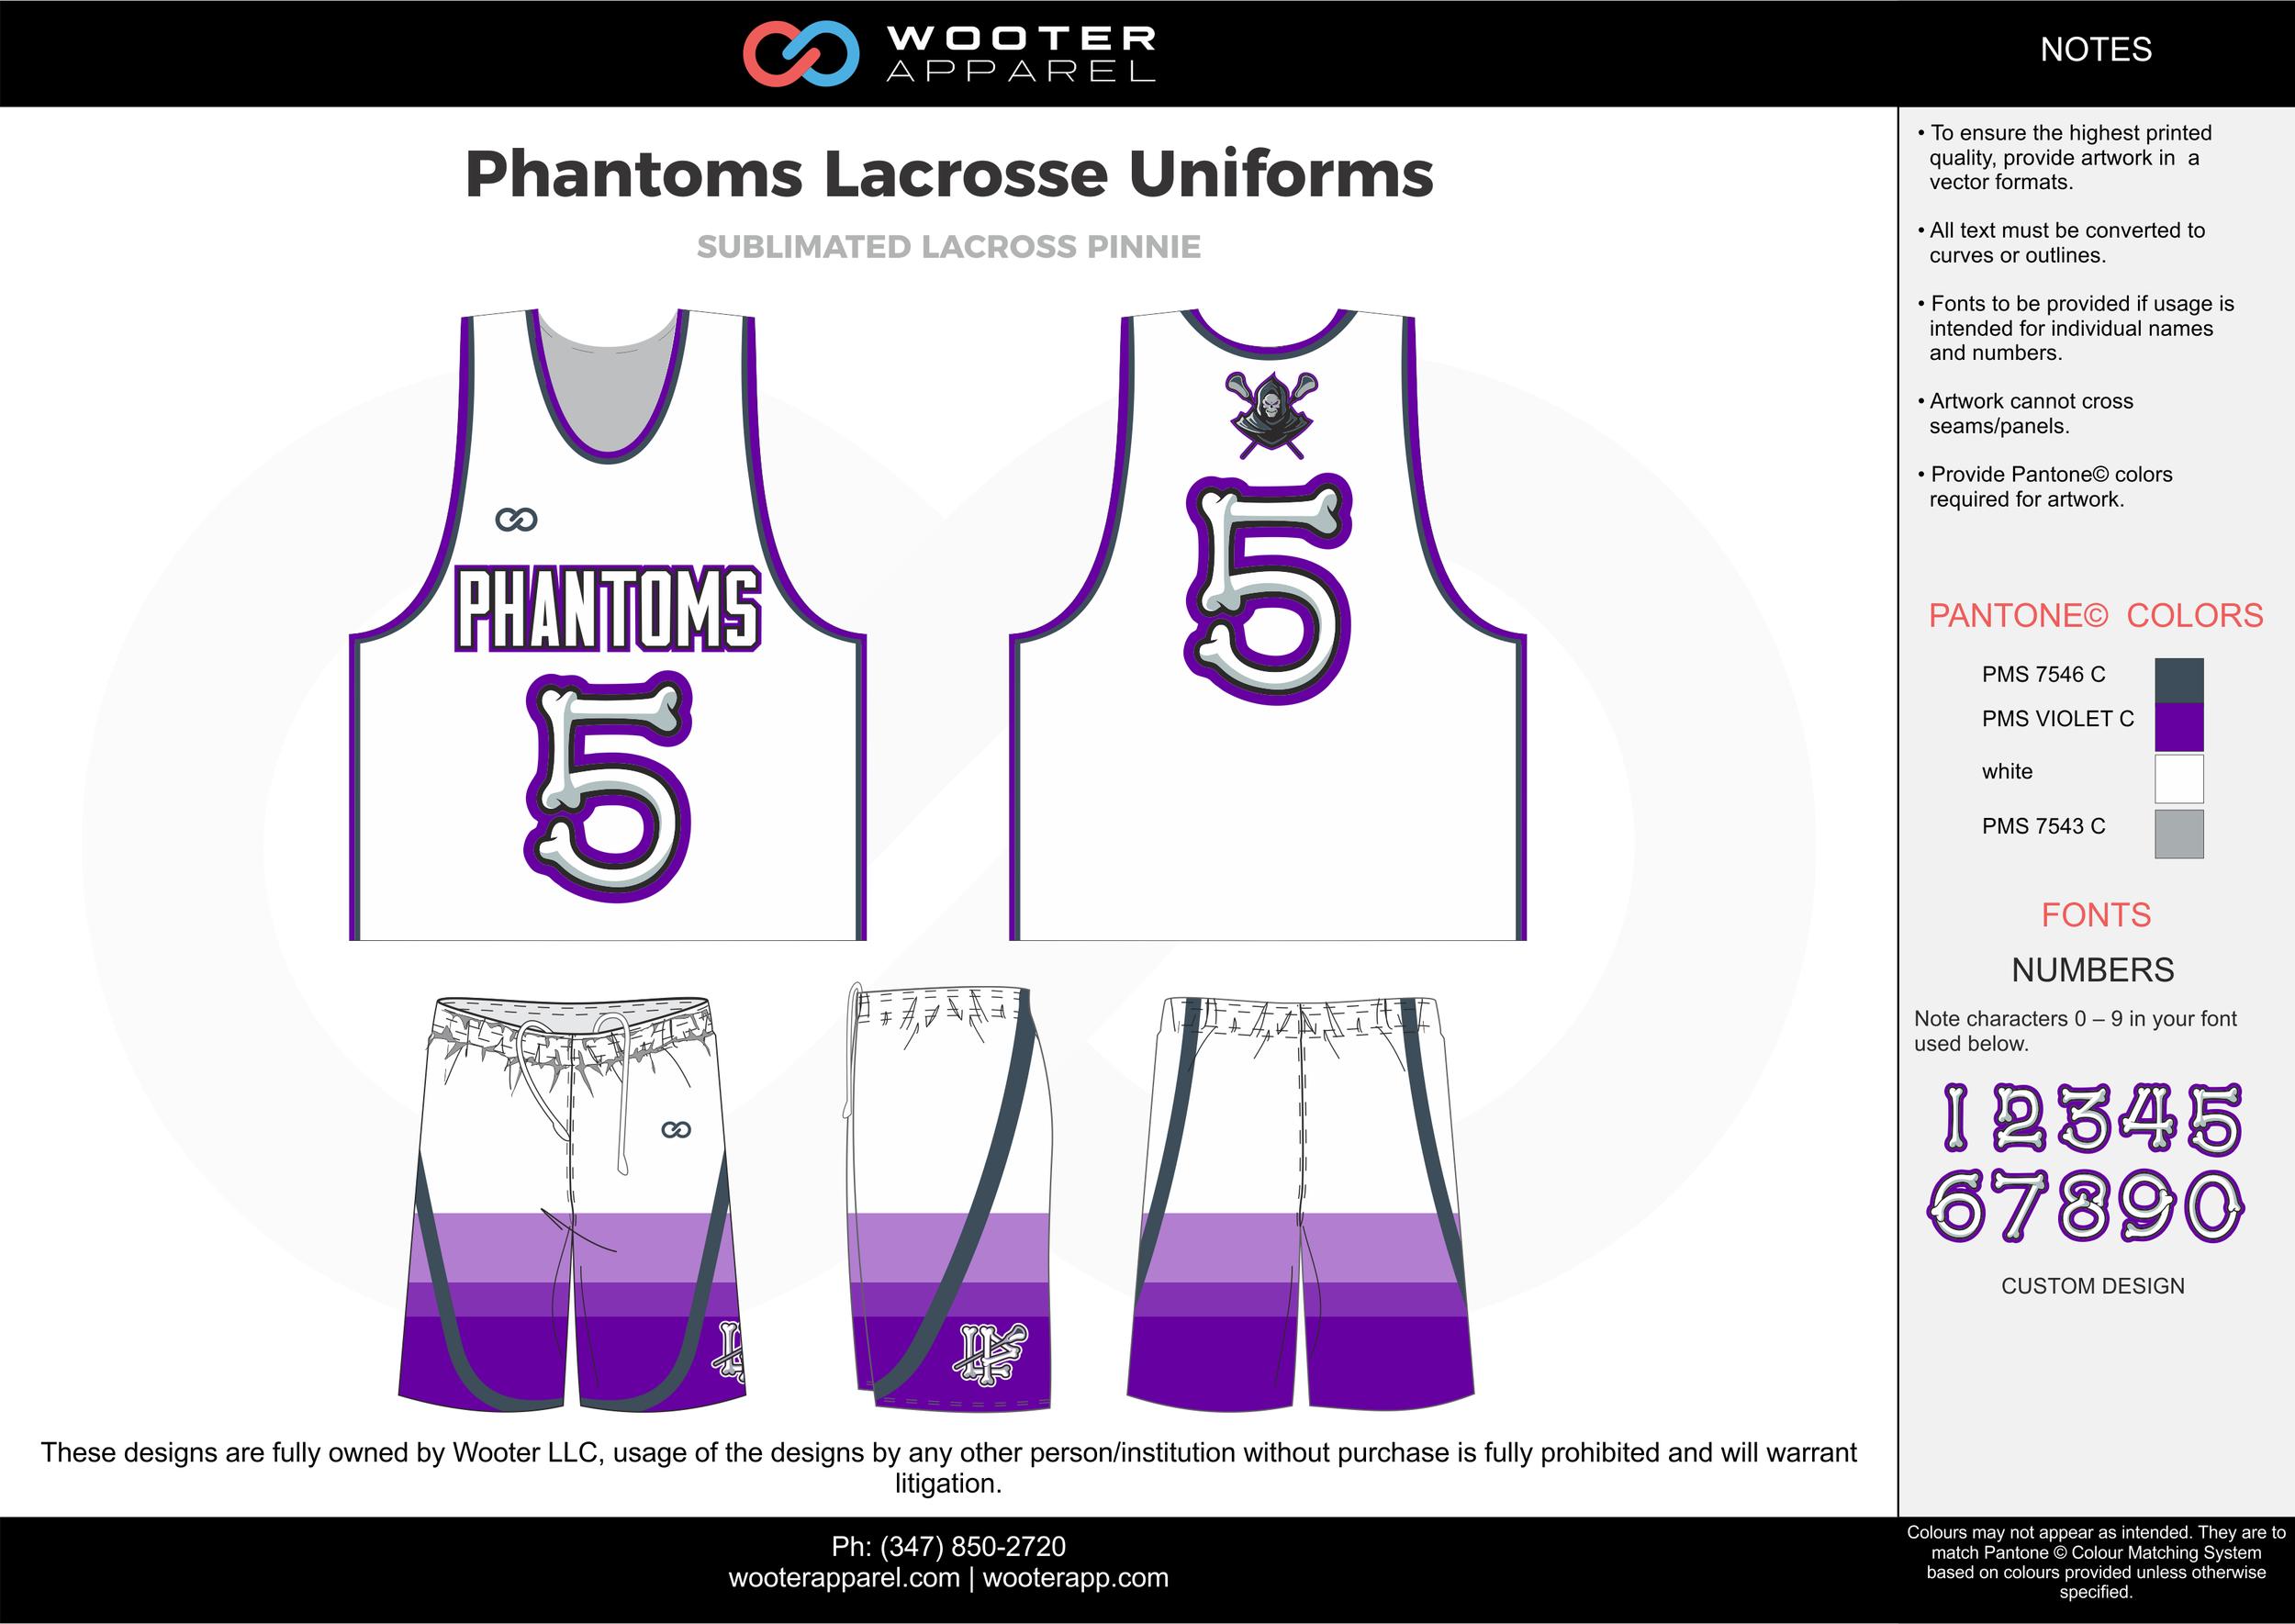 PHANTOMS LACROSSE UNIFORMS purple gray white Lacrosse uniforms pinnies jerseys shorts